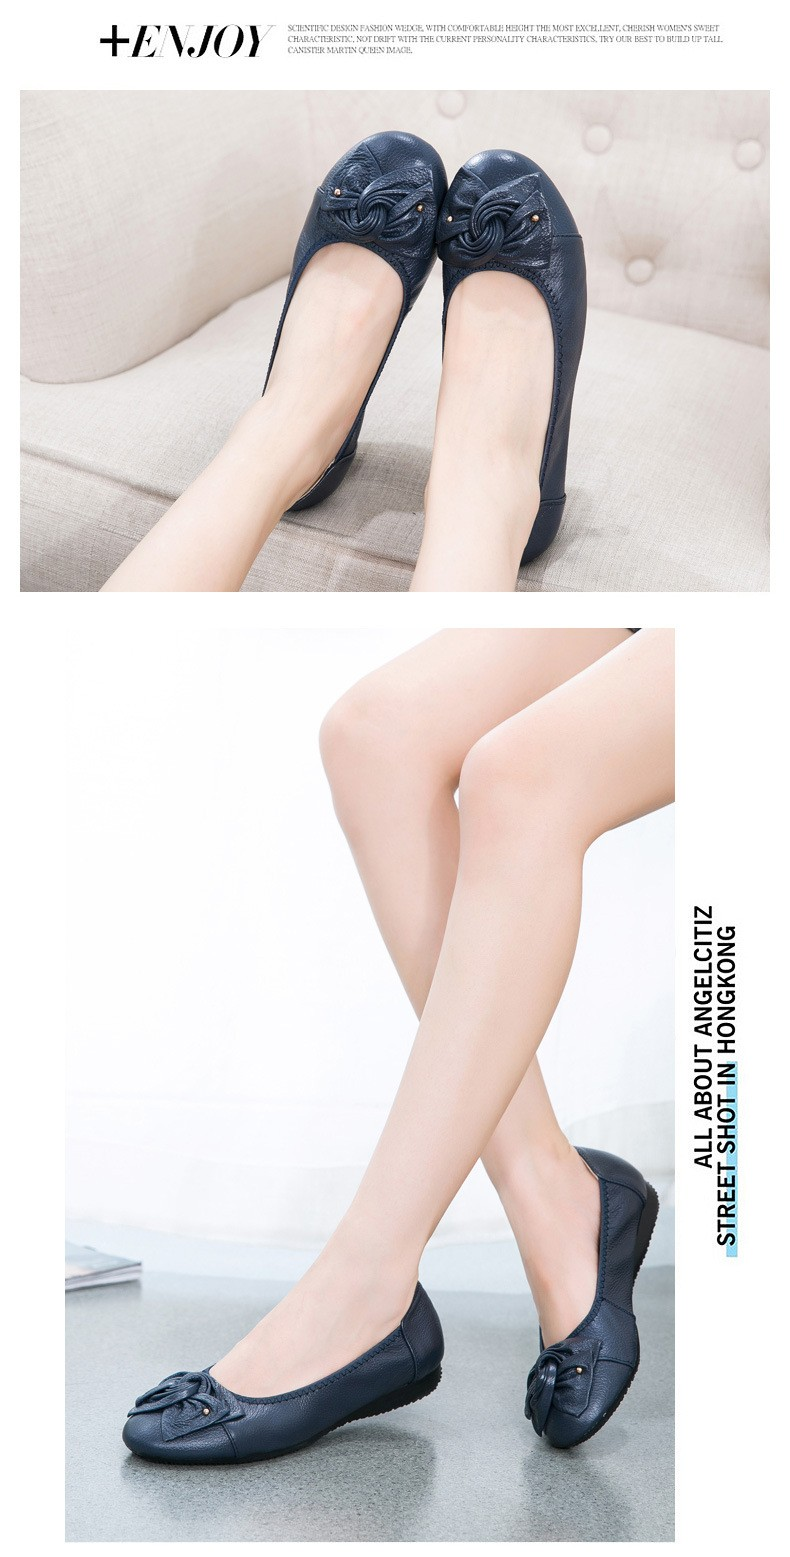 Spring Autumn Genuine Leather Shoes HTB1f7LYJVXXXXbraXXXq6xXFXXX8